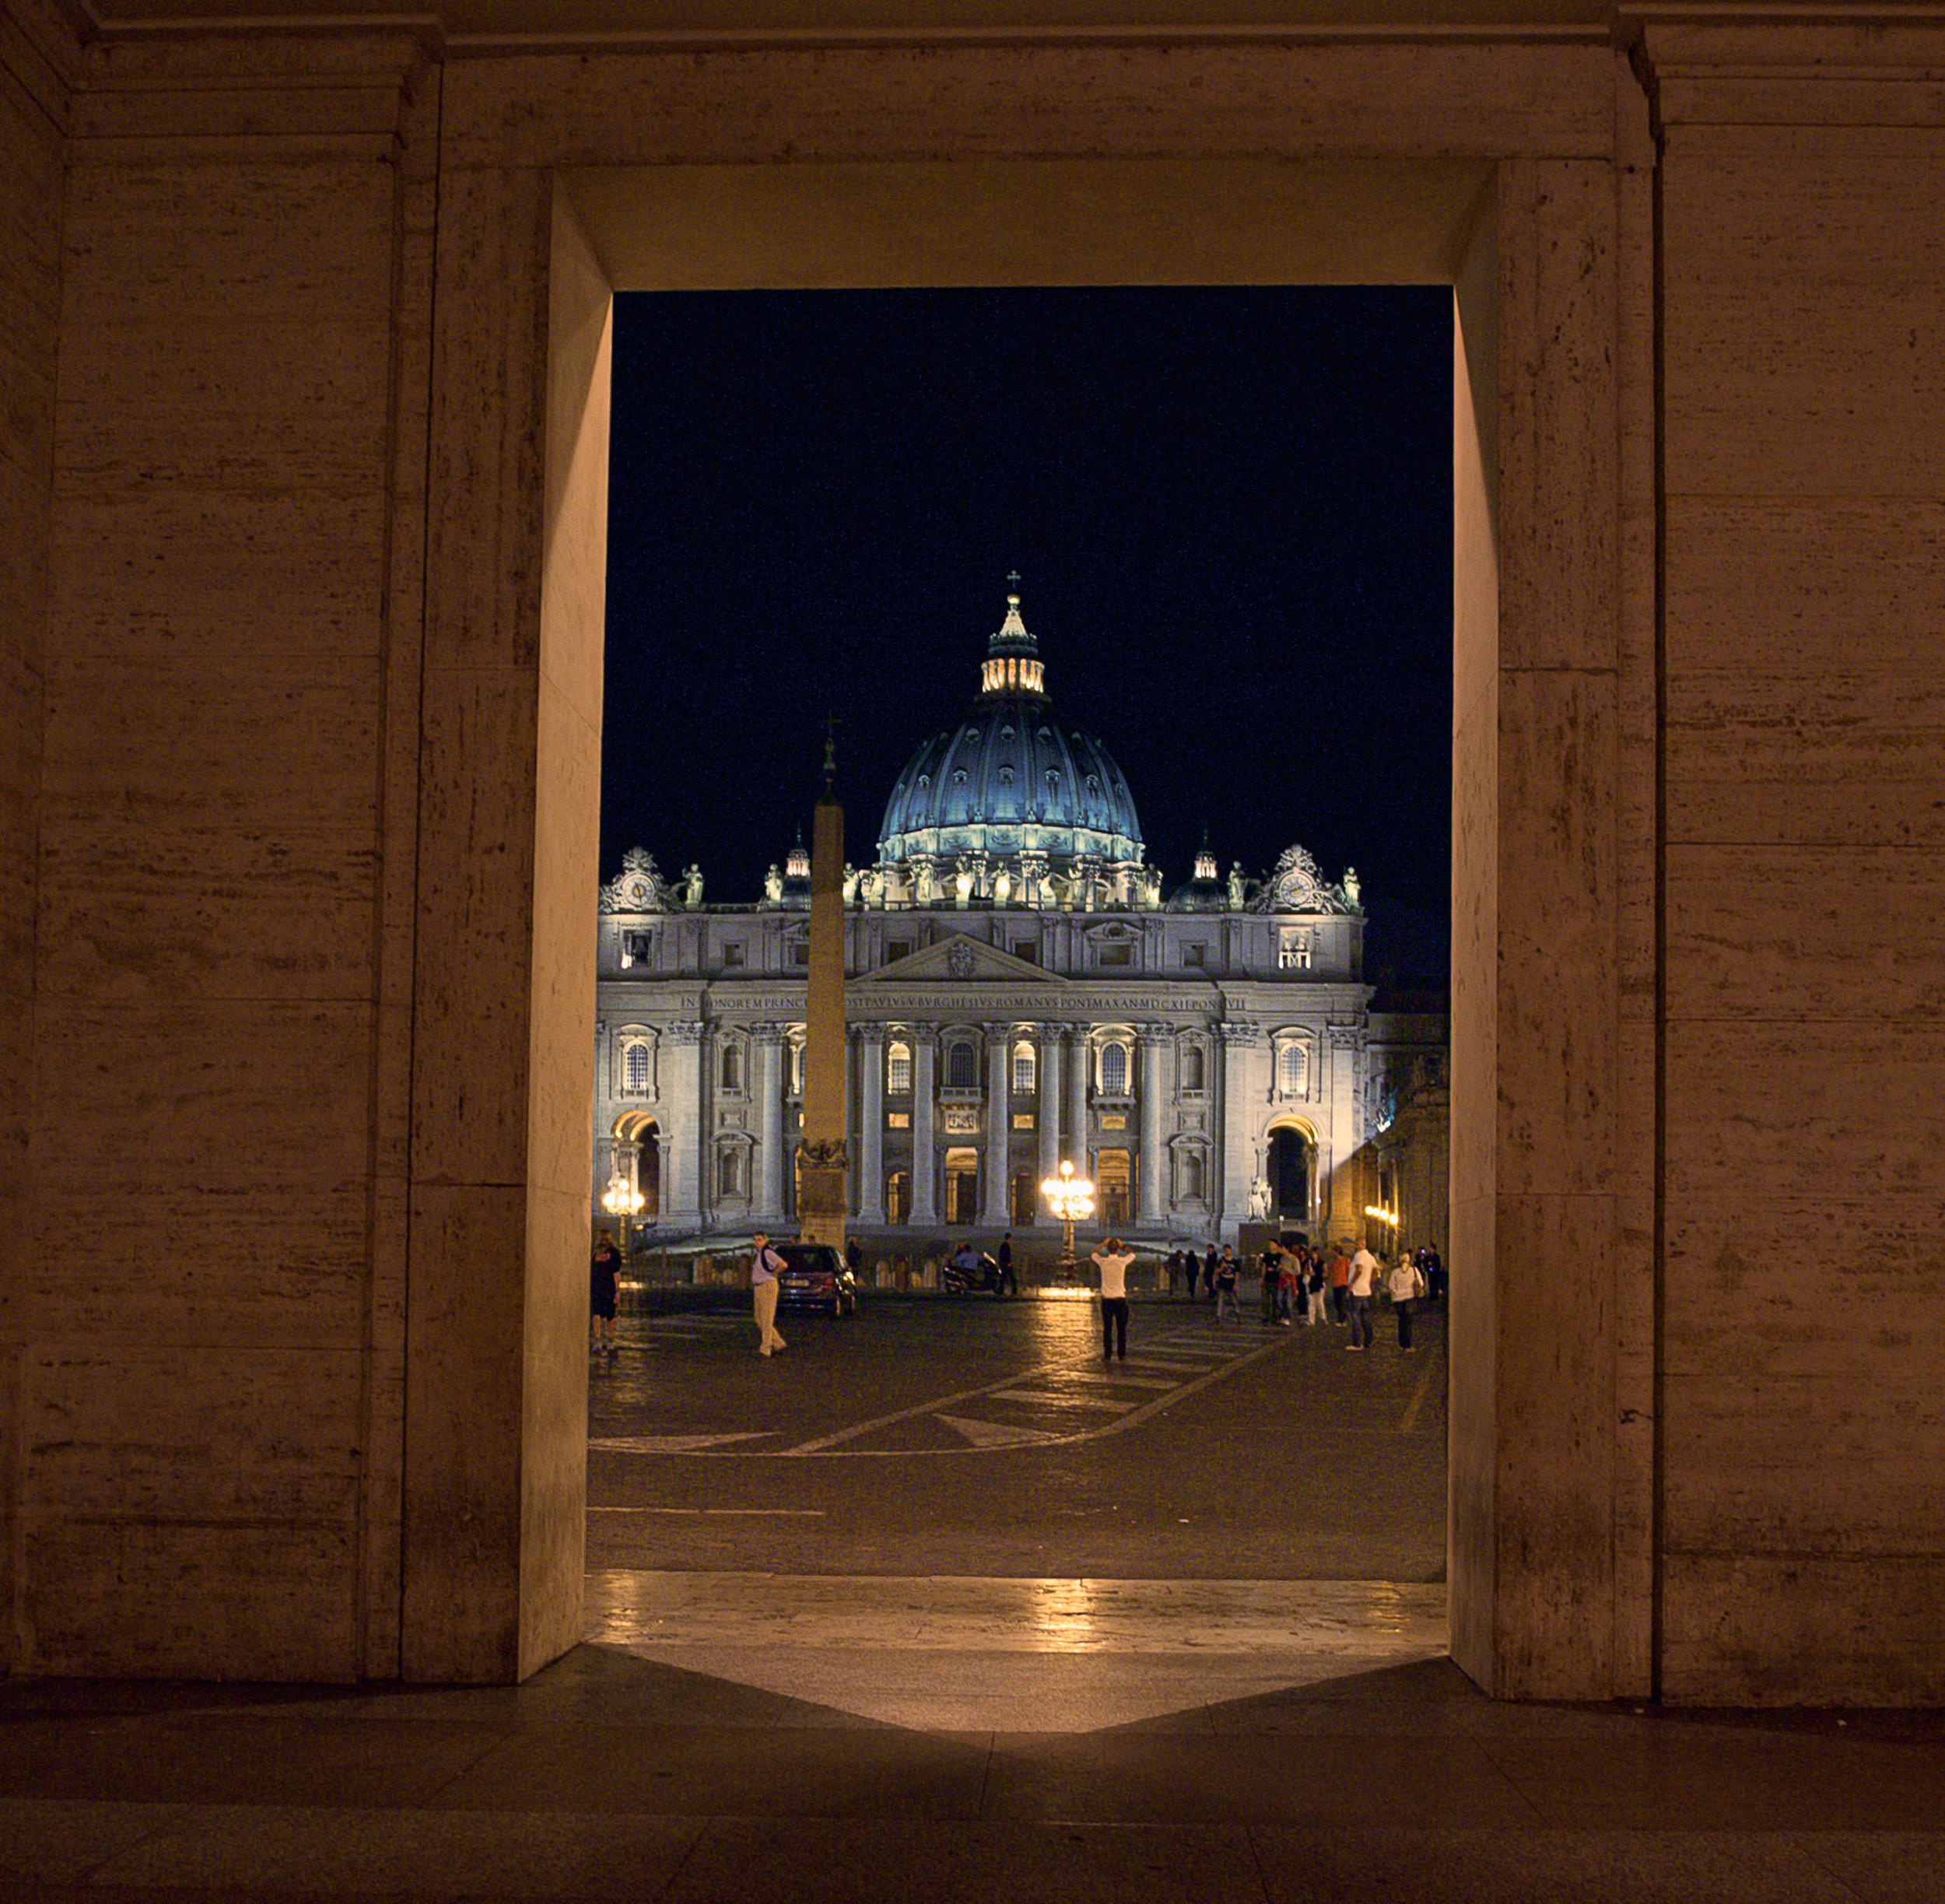 Italy-John Bardell-0831a.jpg